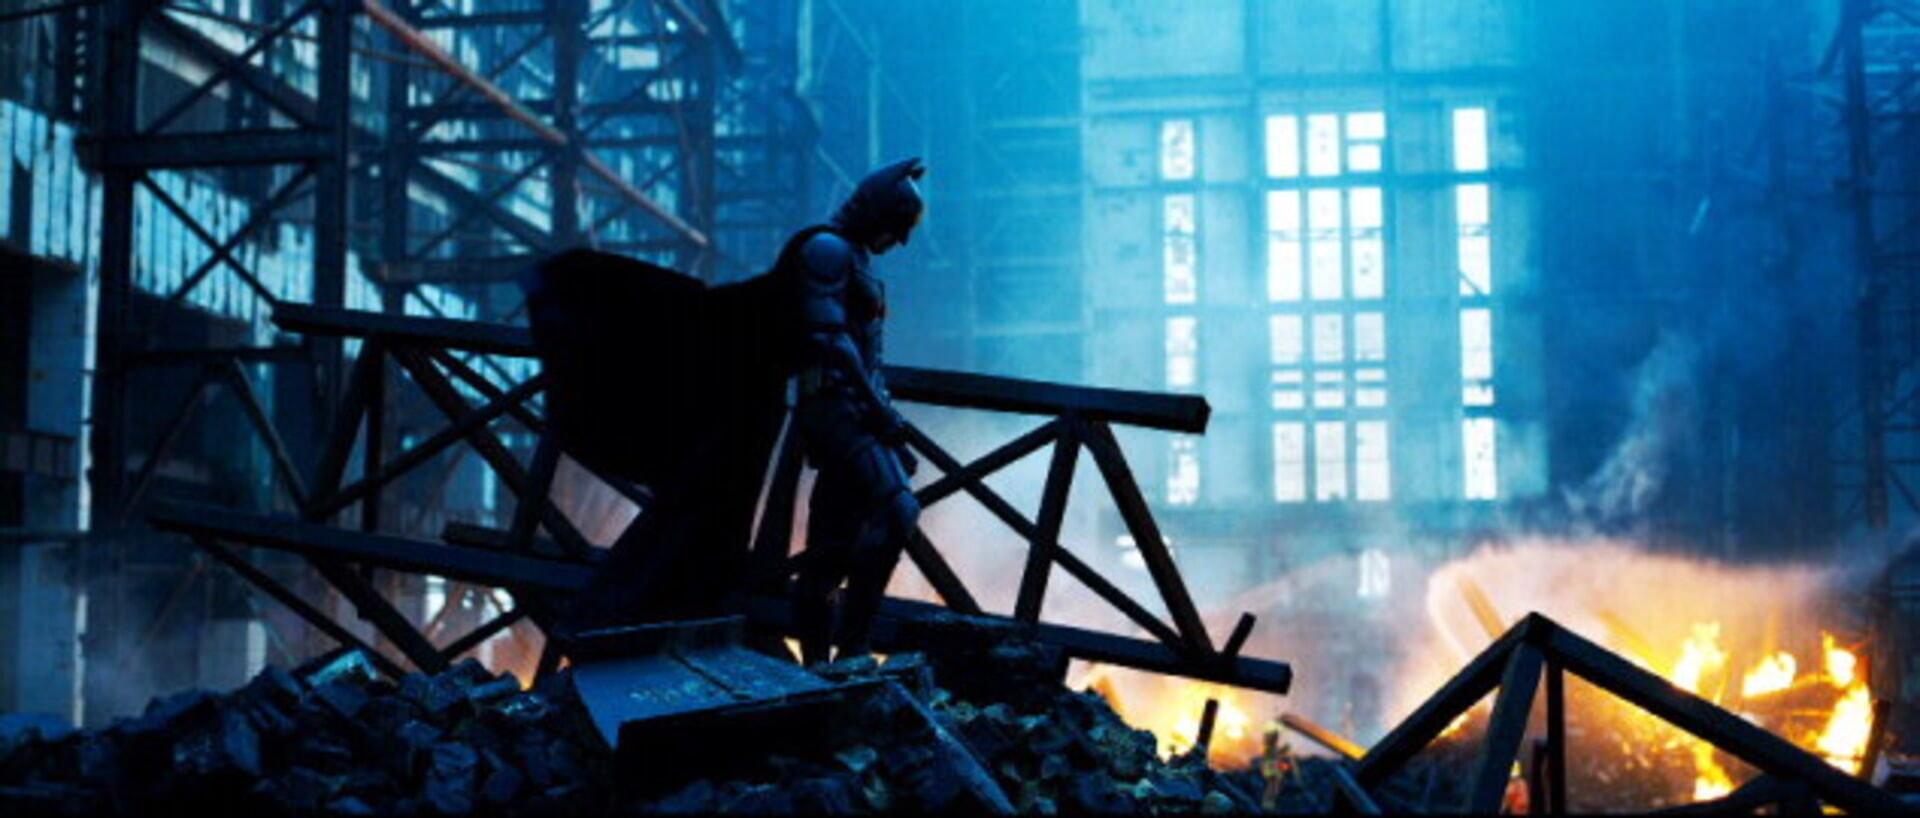 The Dark Knight - Image 5